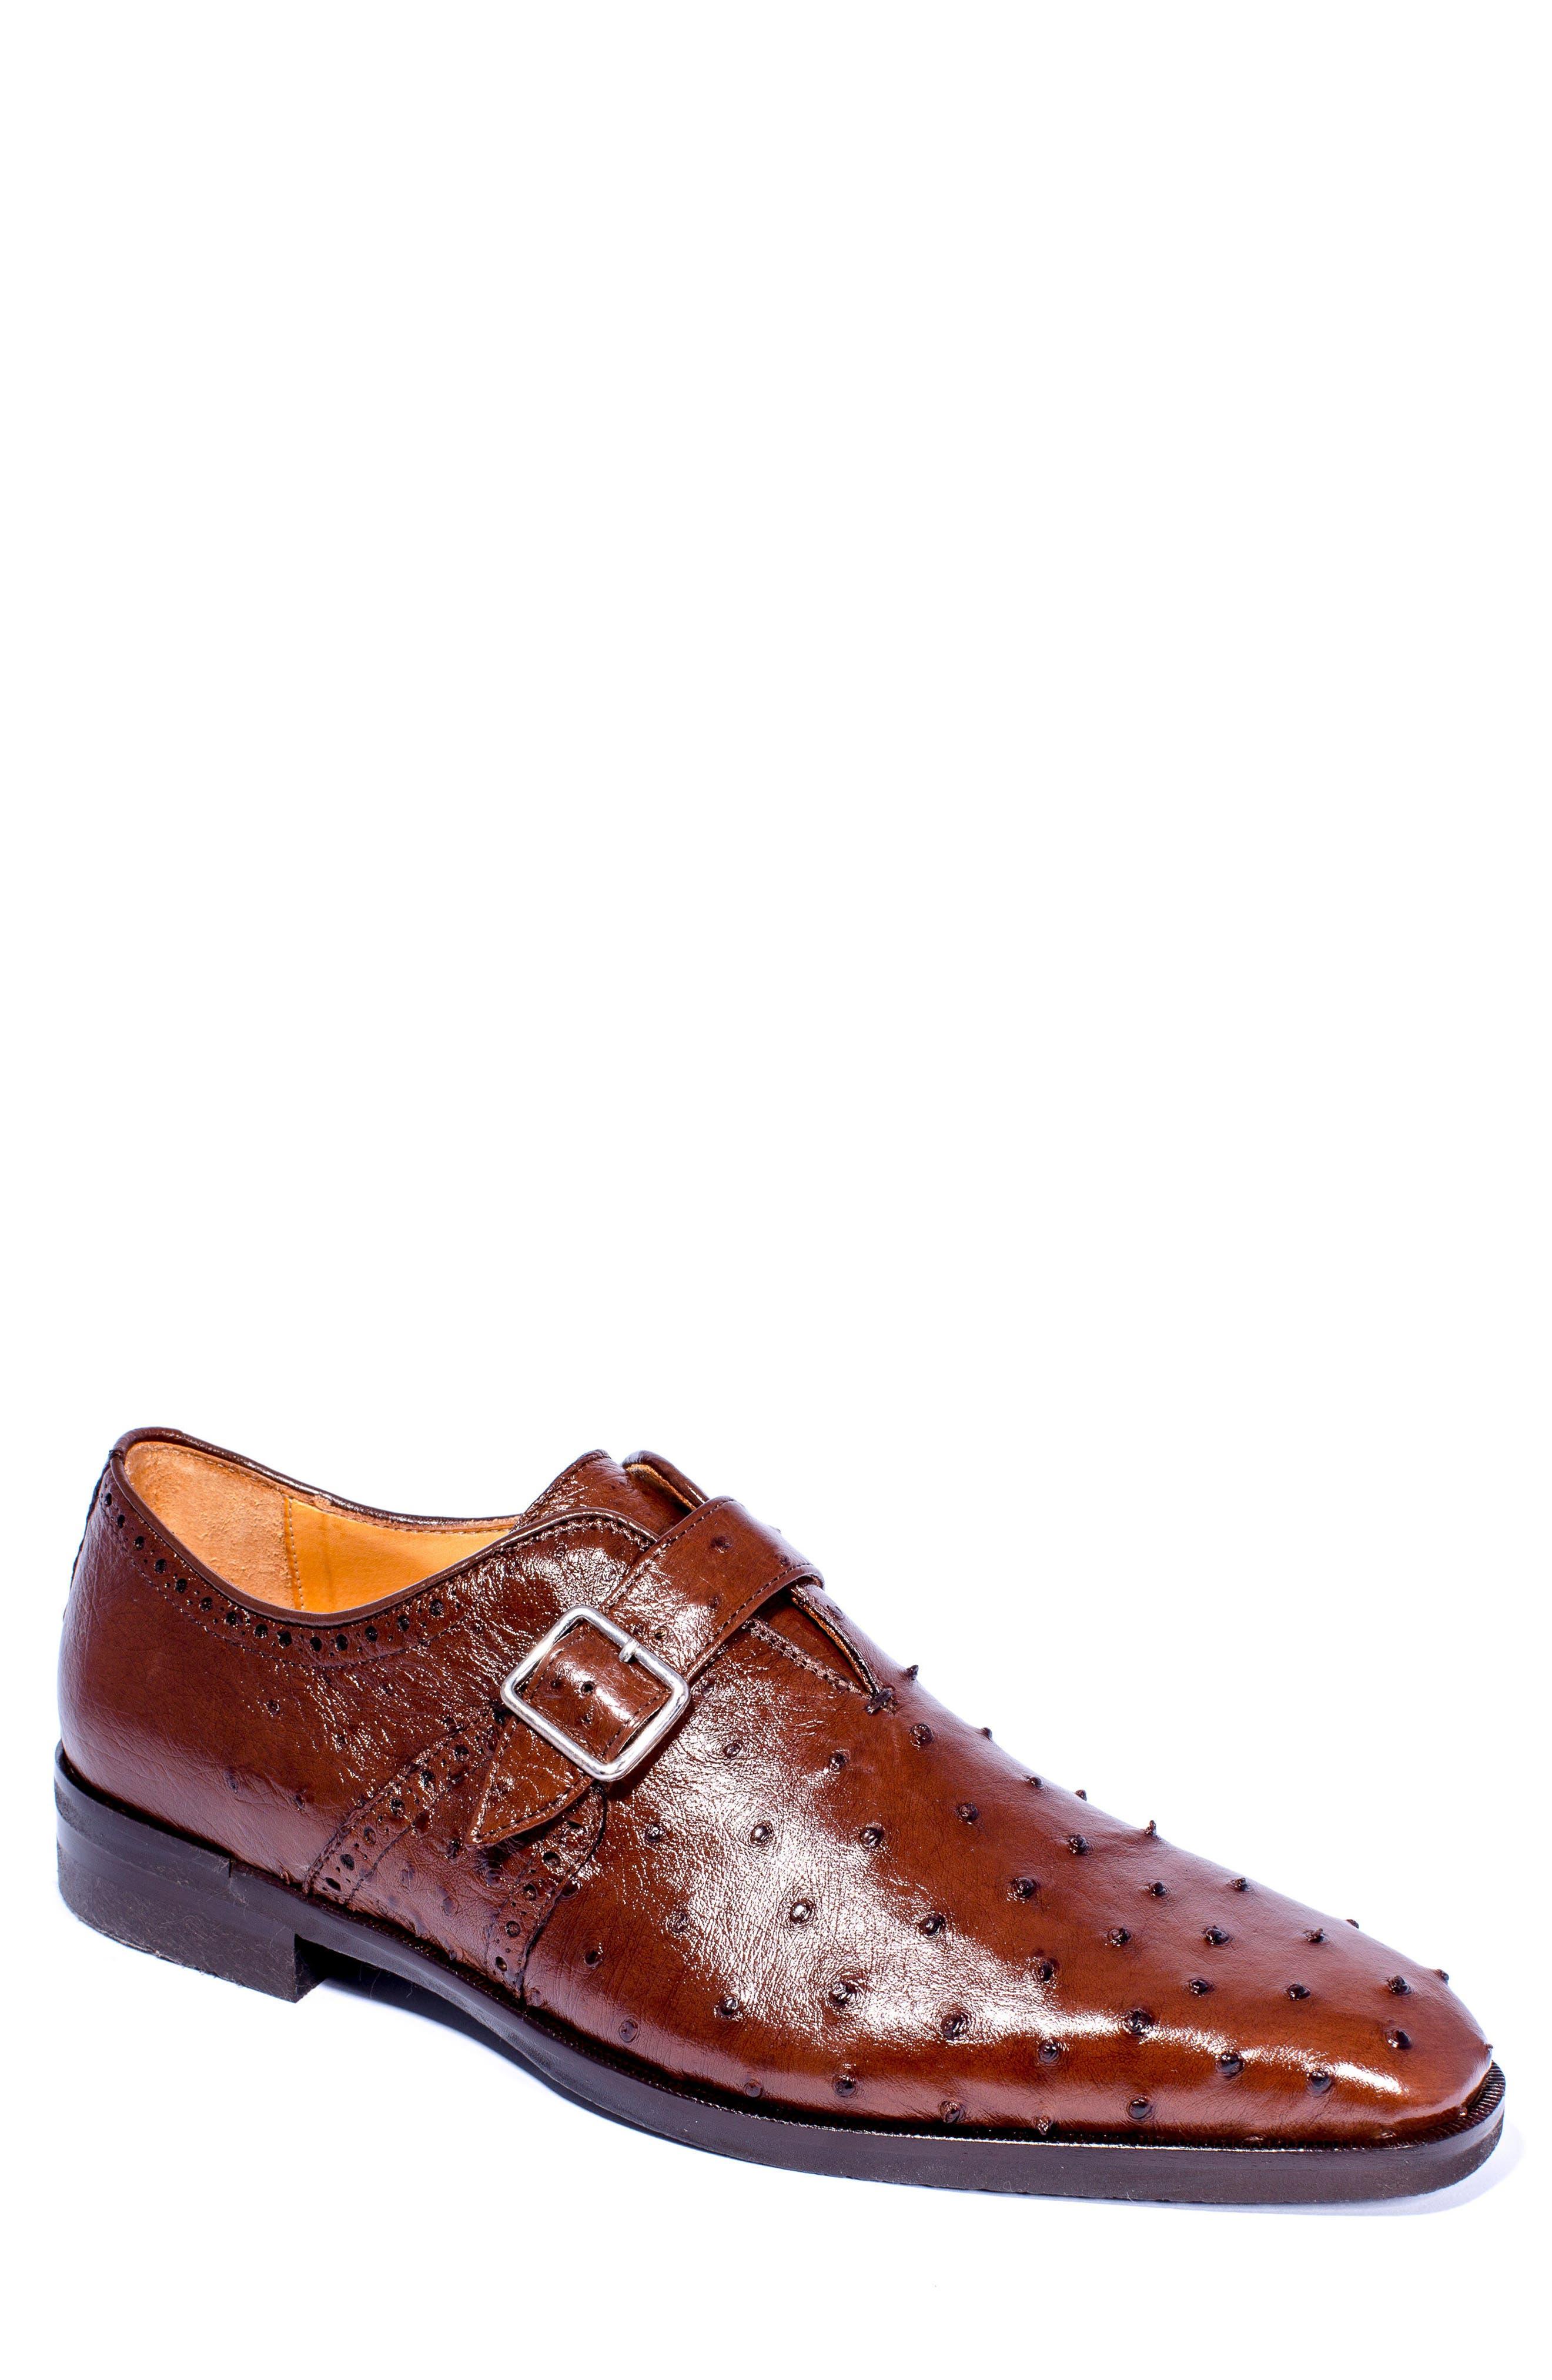 Alternate Image 1 Selected - Zelli Antonio Monk Strap Ostrich Leather Shoe (Men)